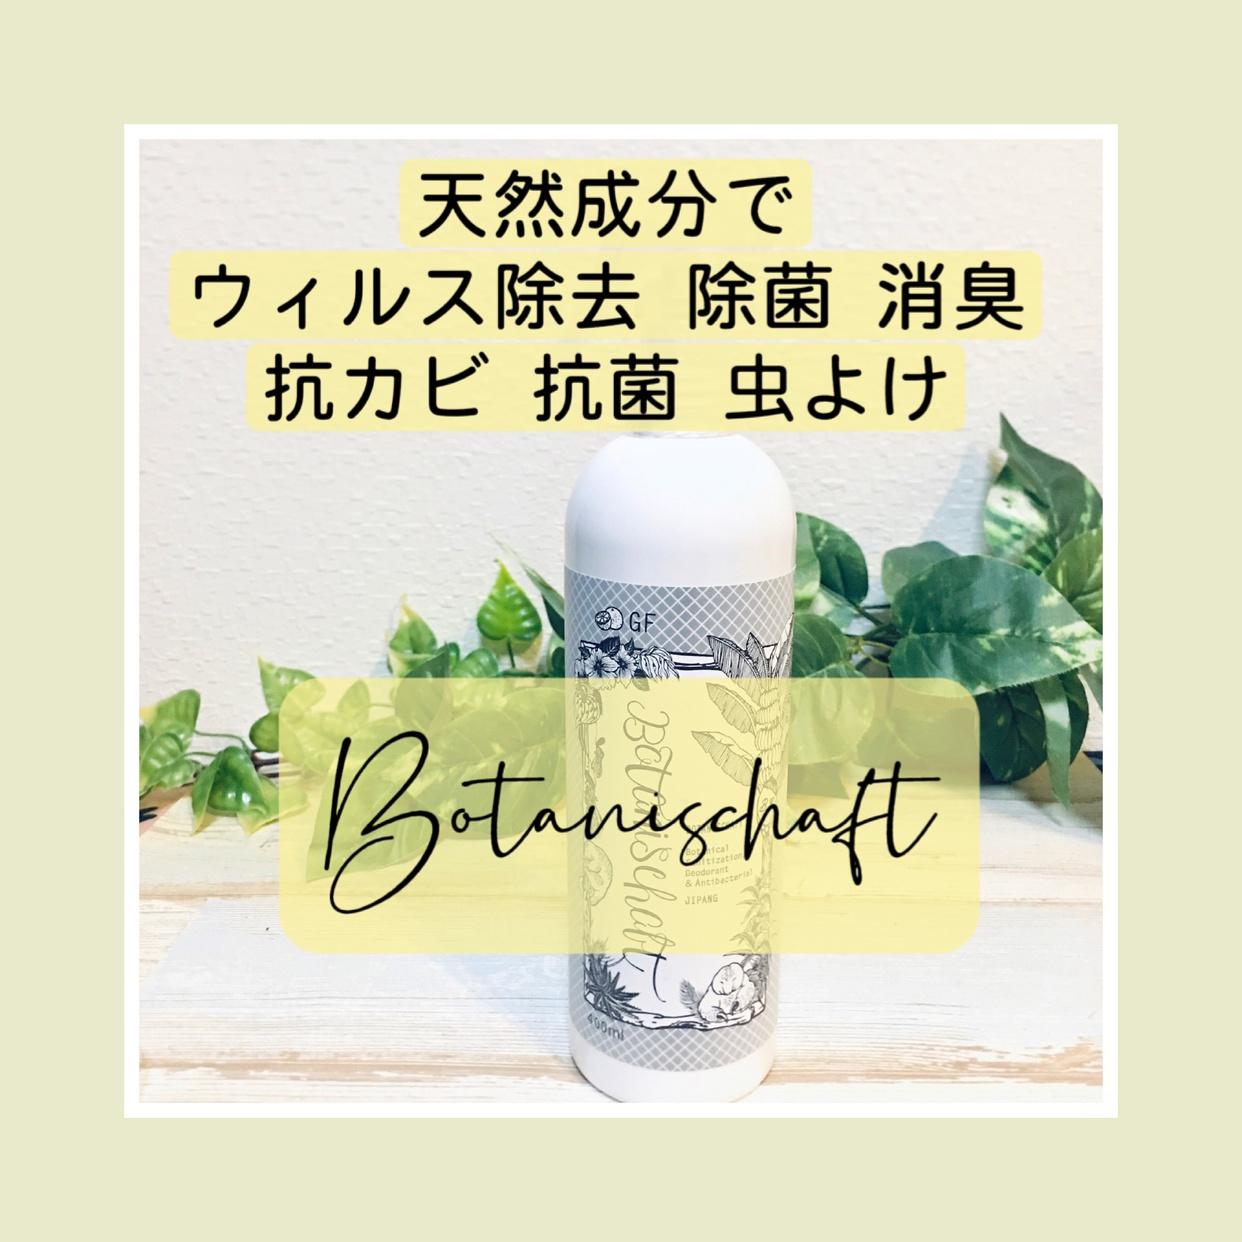 Botanischaft(ボタニシャフト) 除菌スプレーを使った有姫さんのクチコミ画像2